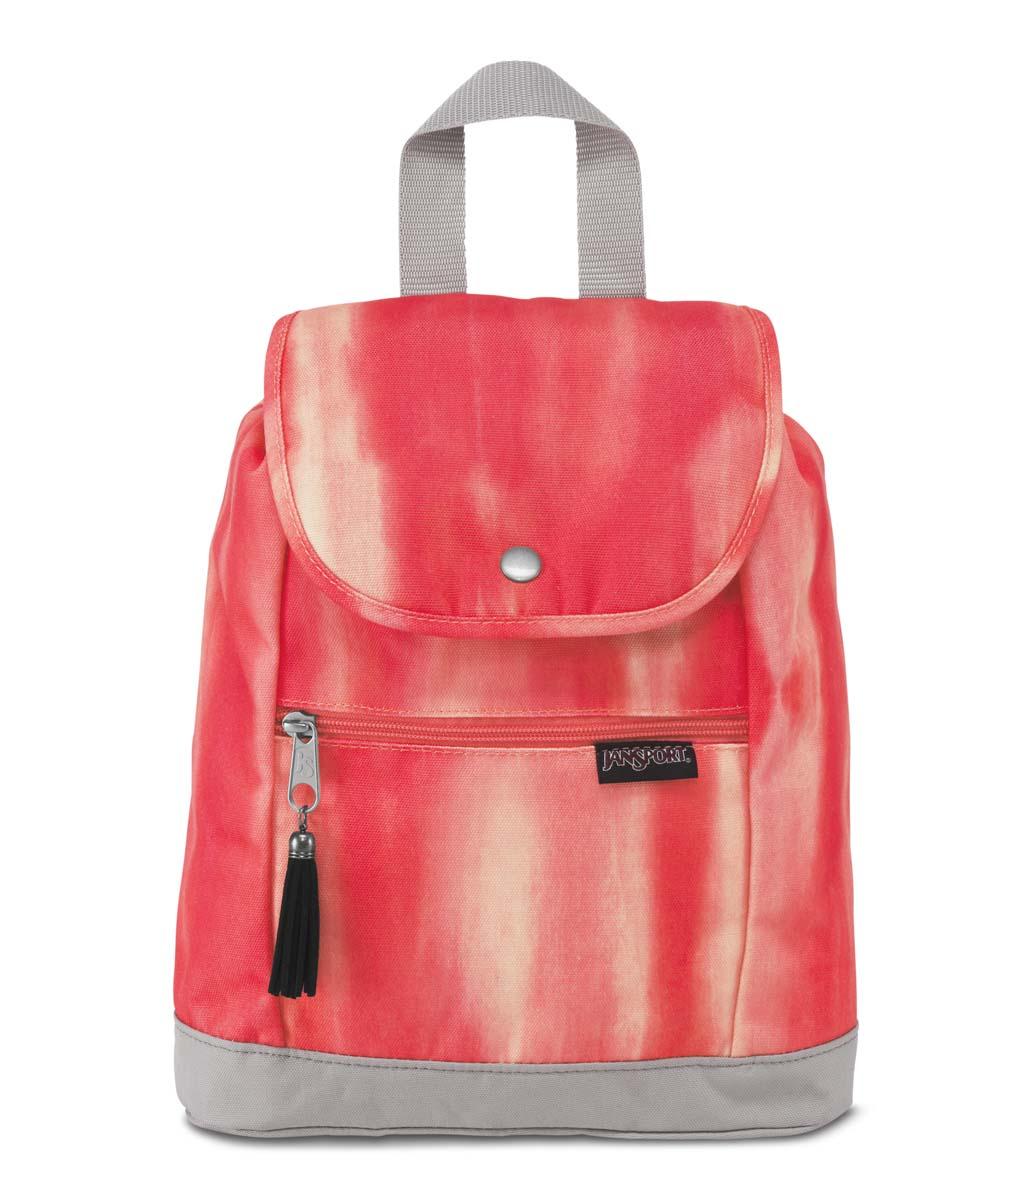 JanSport กระเป๋าเป้ รุ่น Abbie - Sunkissed Poly Canvas